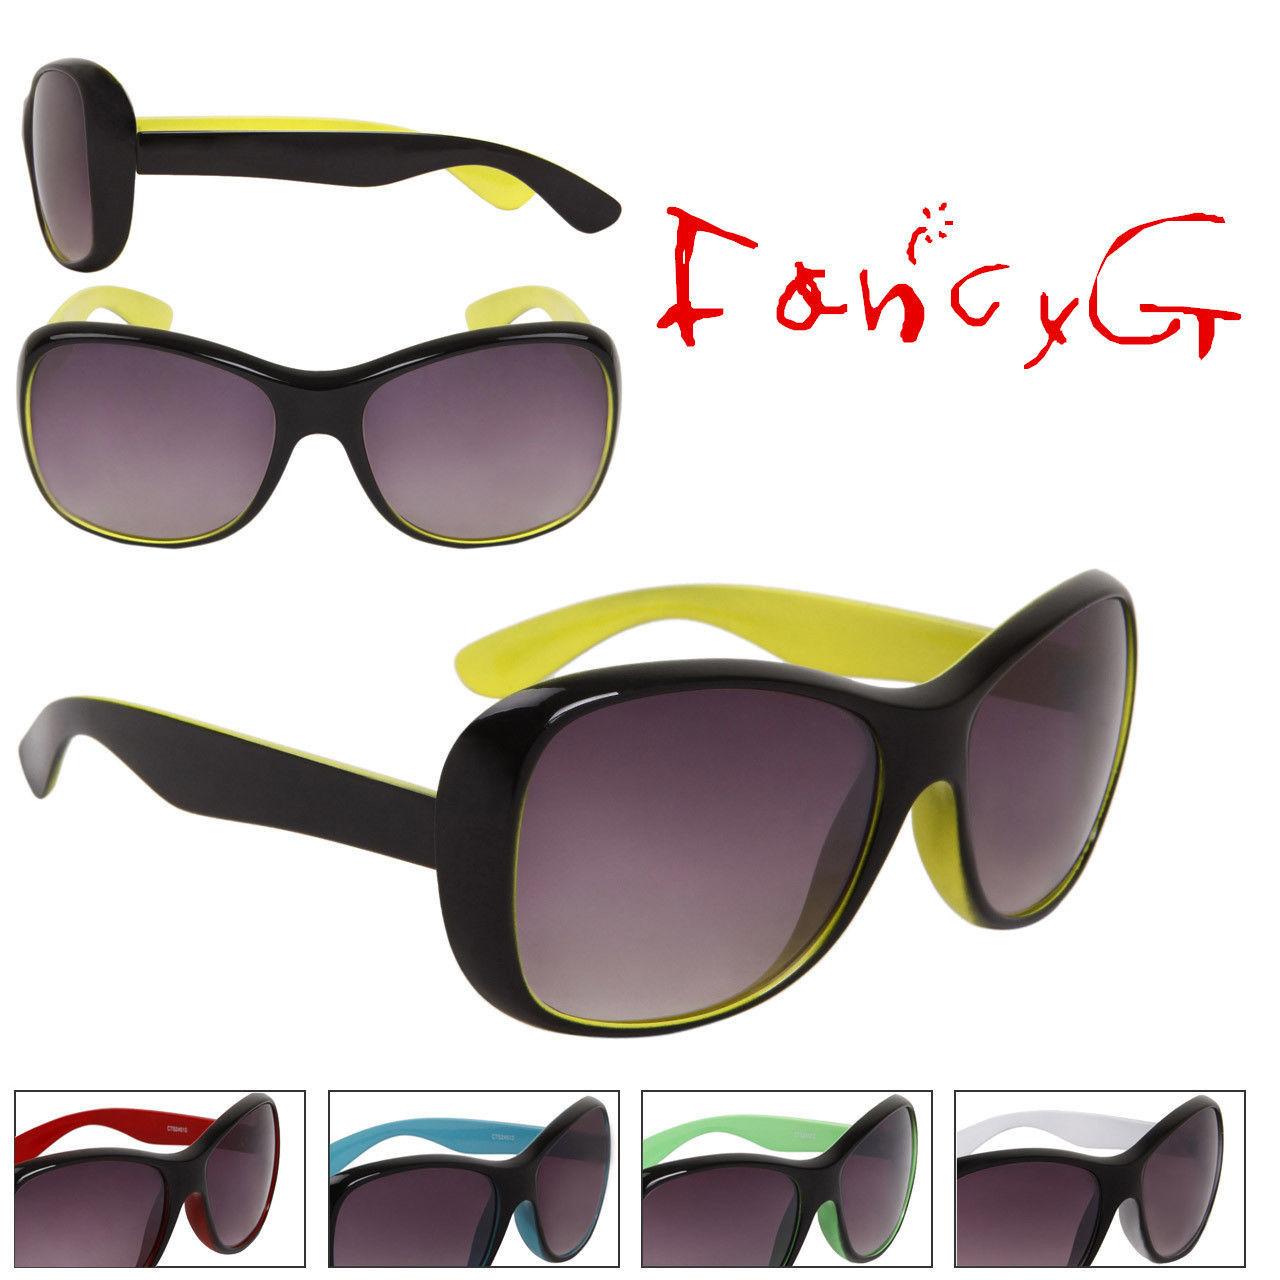 12 Assorted Unisex Fashion Sunglasses Fashion Tone UV 400 Protection